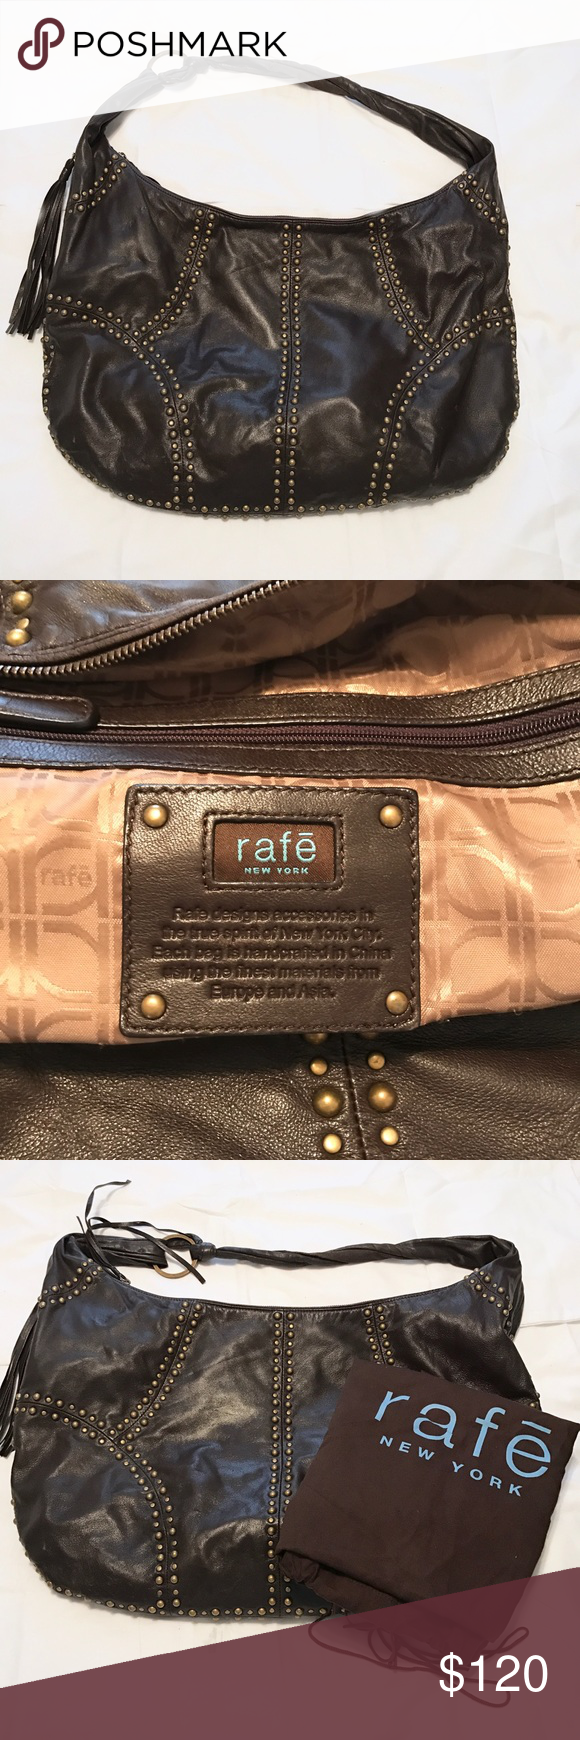 bb82e89dd1 Rafe Leather Bag Rafe New York Large Soft Leather Bag. Great Condition. Rafe  New York Bags Hobos